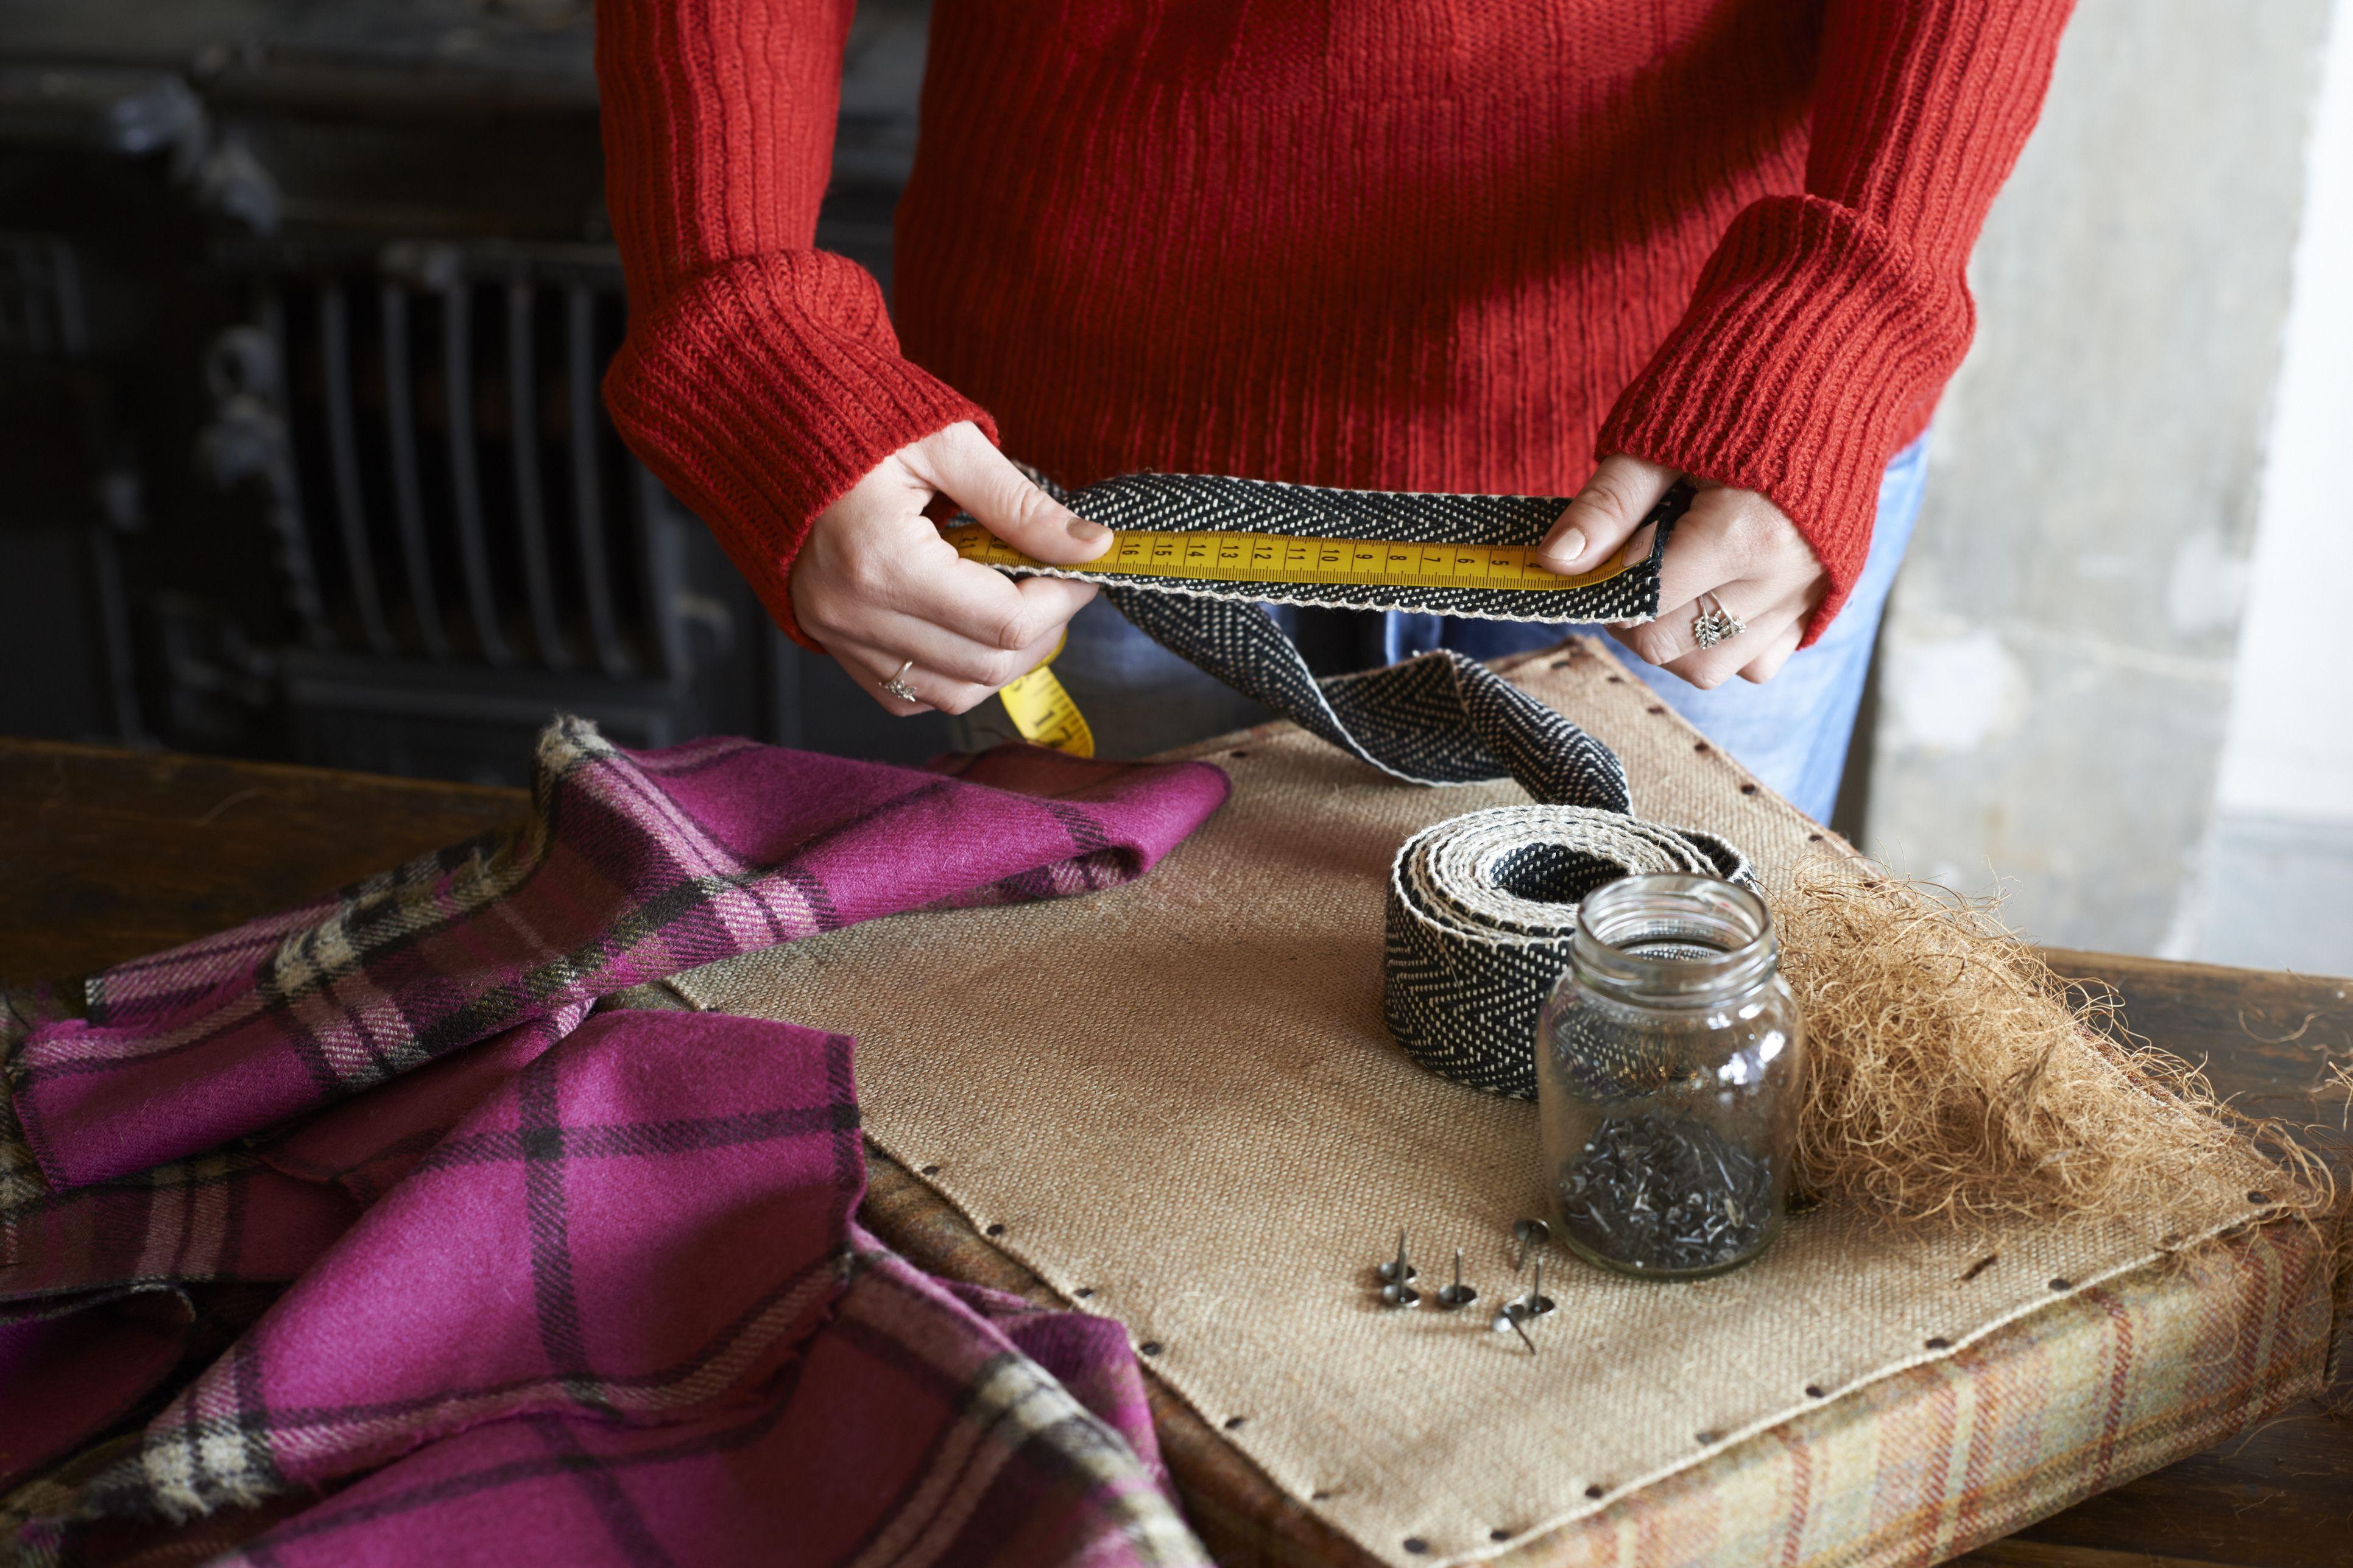 Woman measuring upholstery webbing